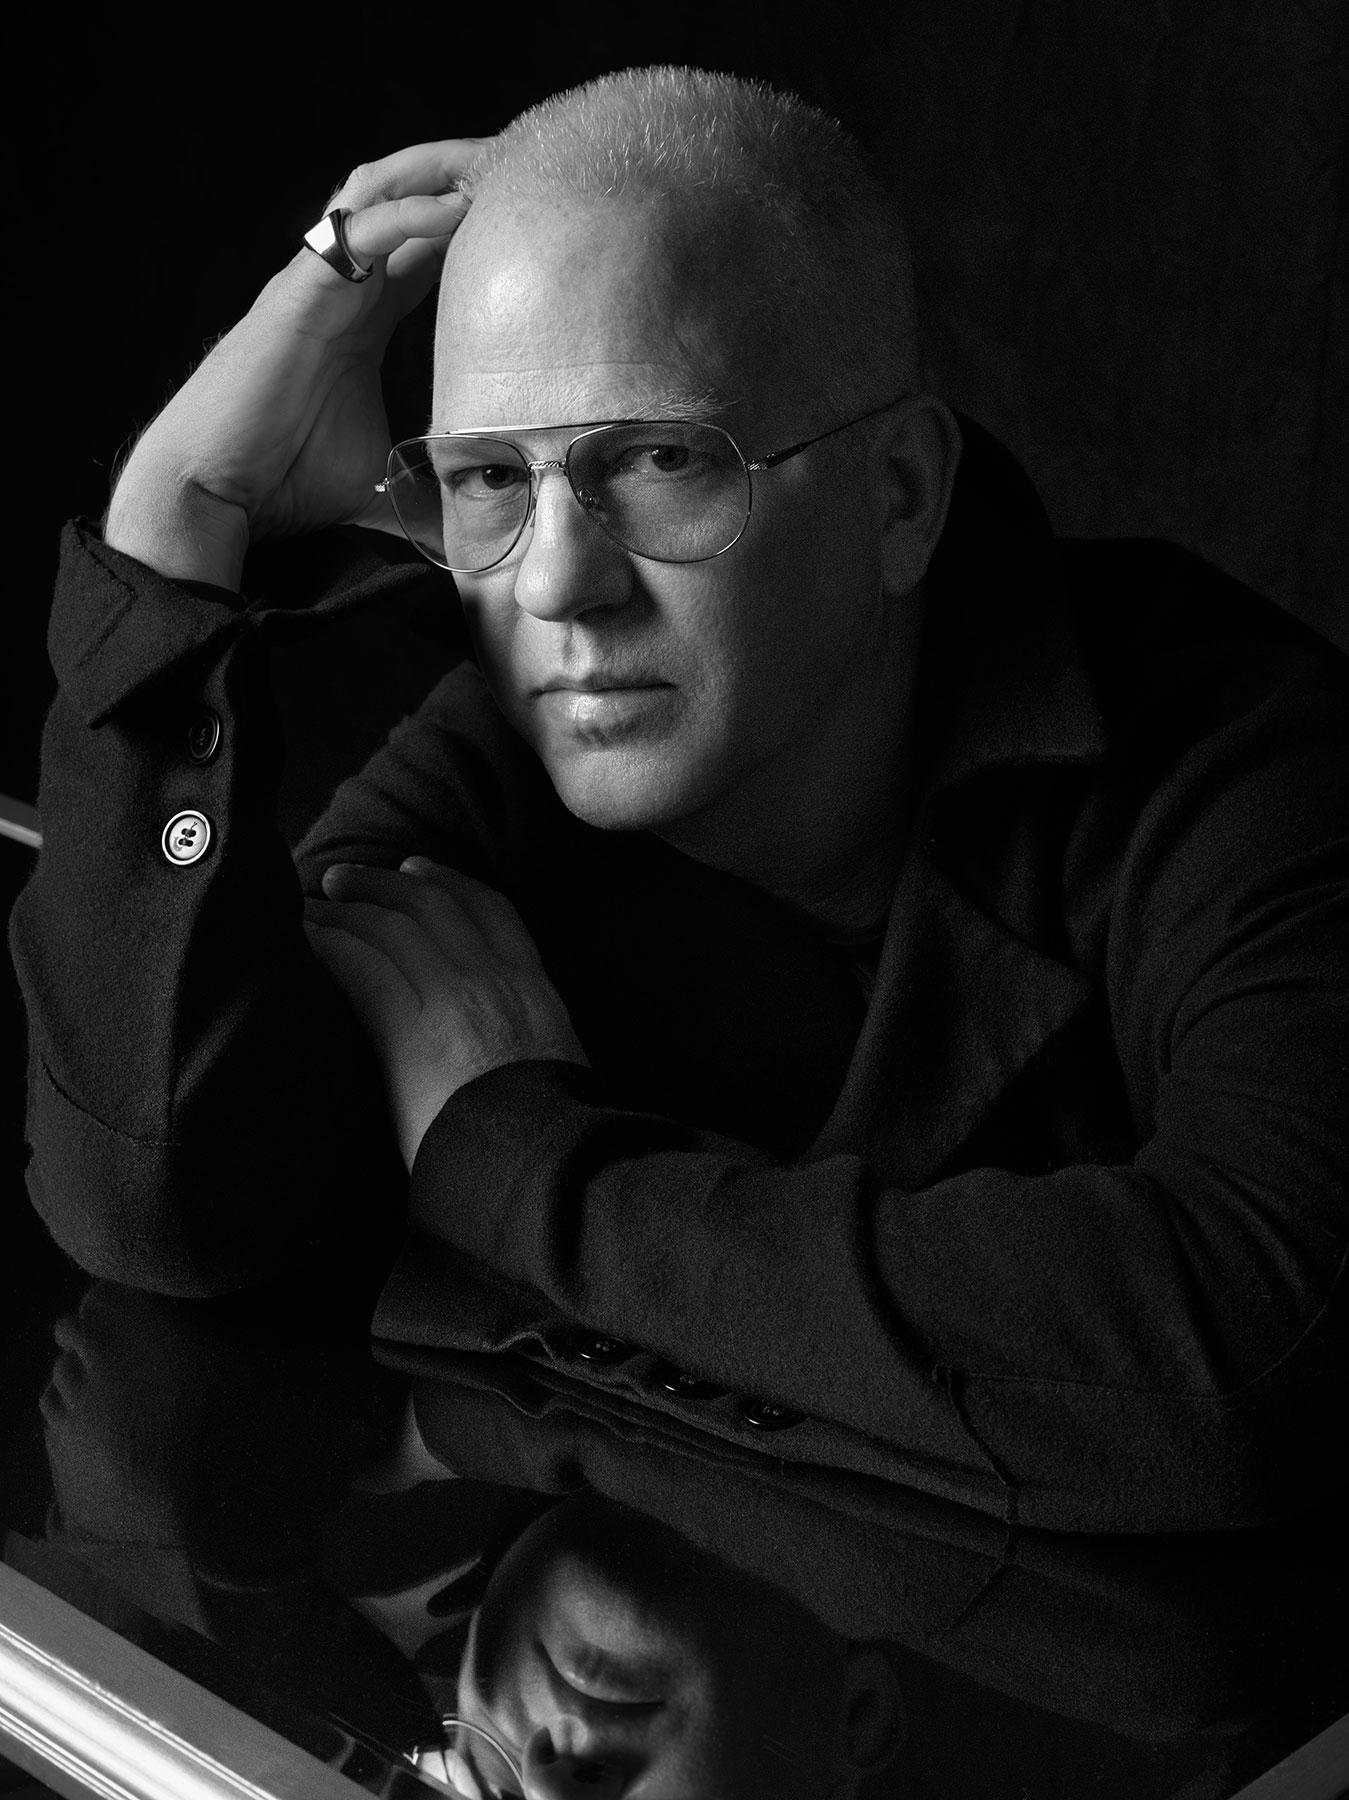 American screenwriter Ryan Murphy